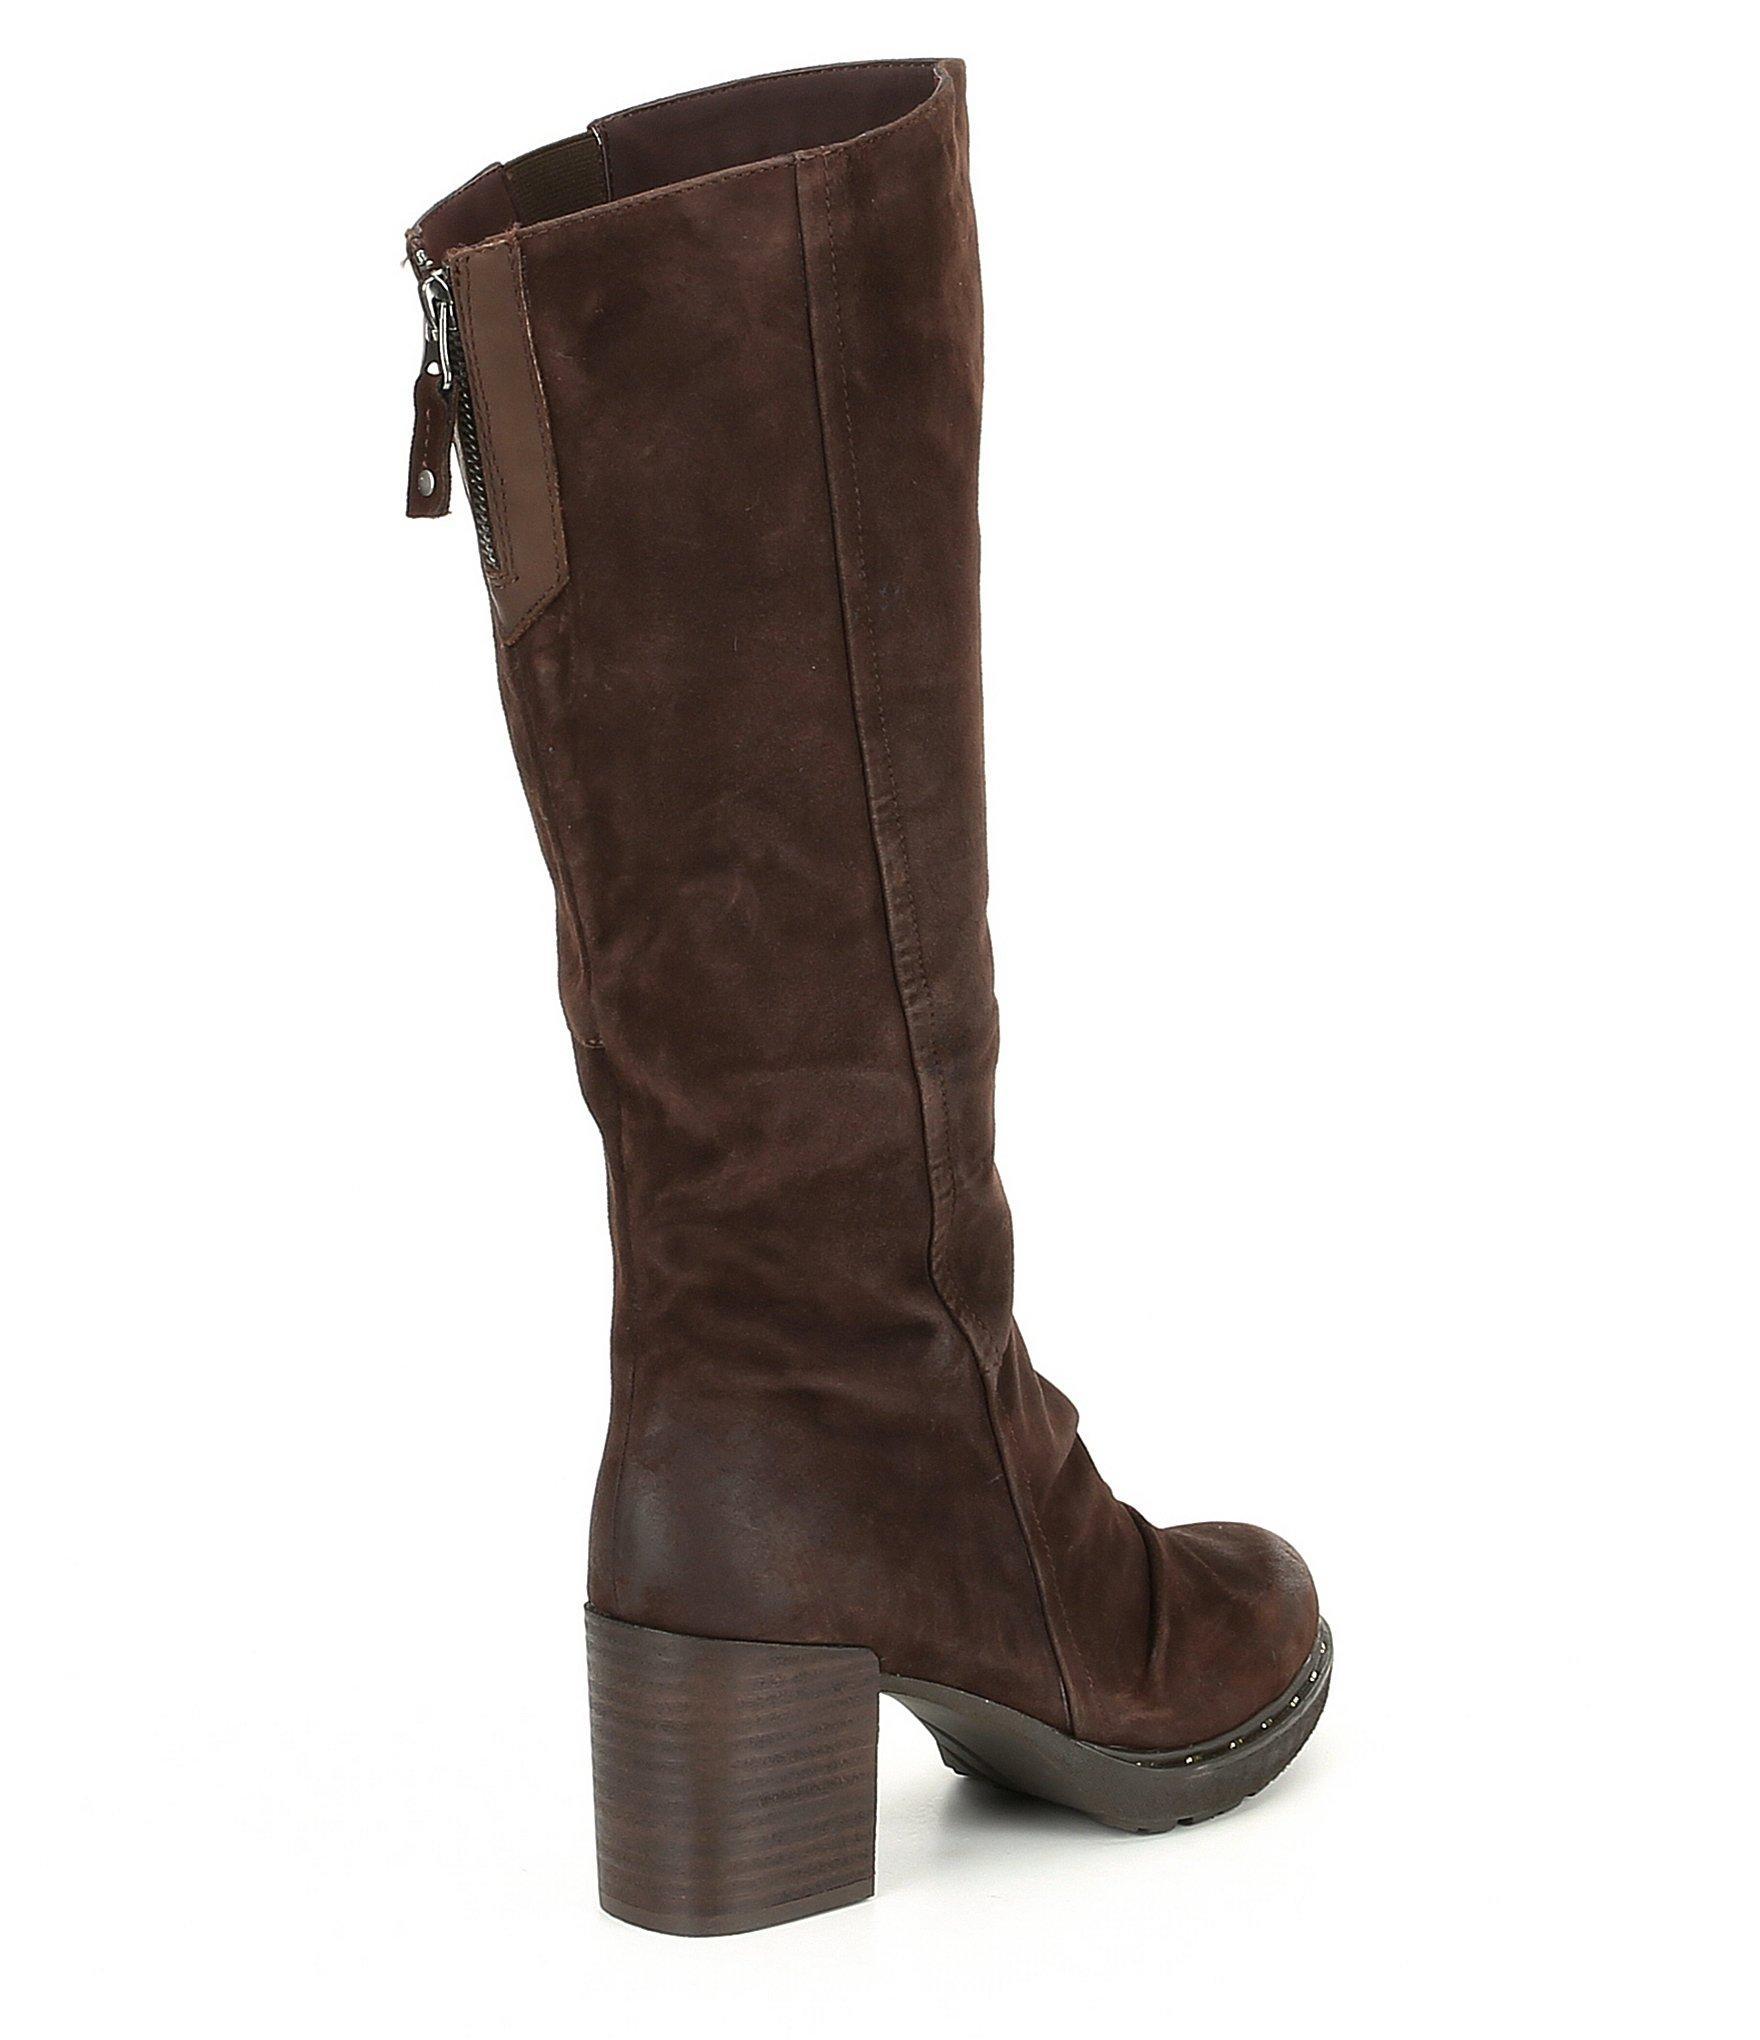 ea6058f01269 Lyst - Otbt Gambol Leather Block Heel Boots in Brown